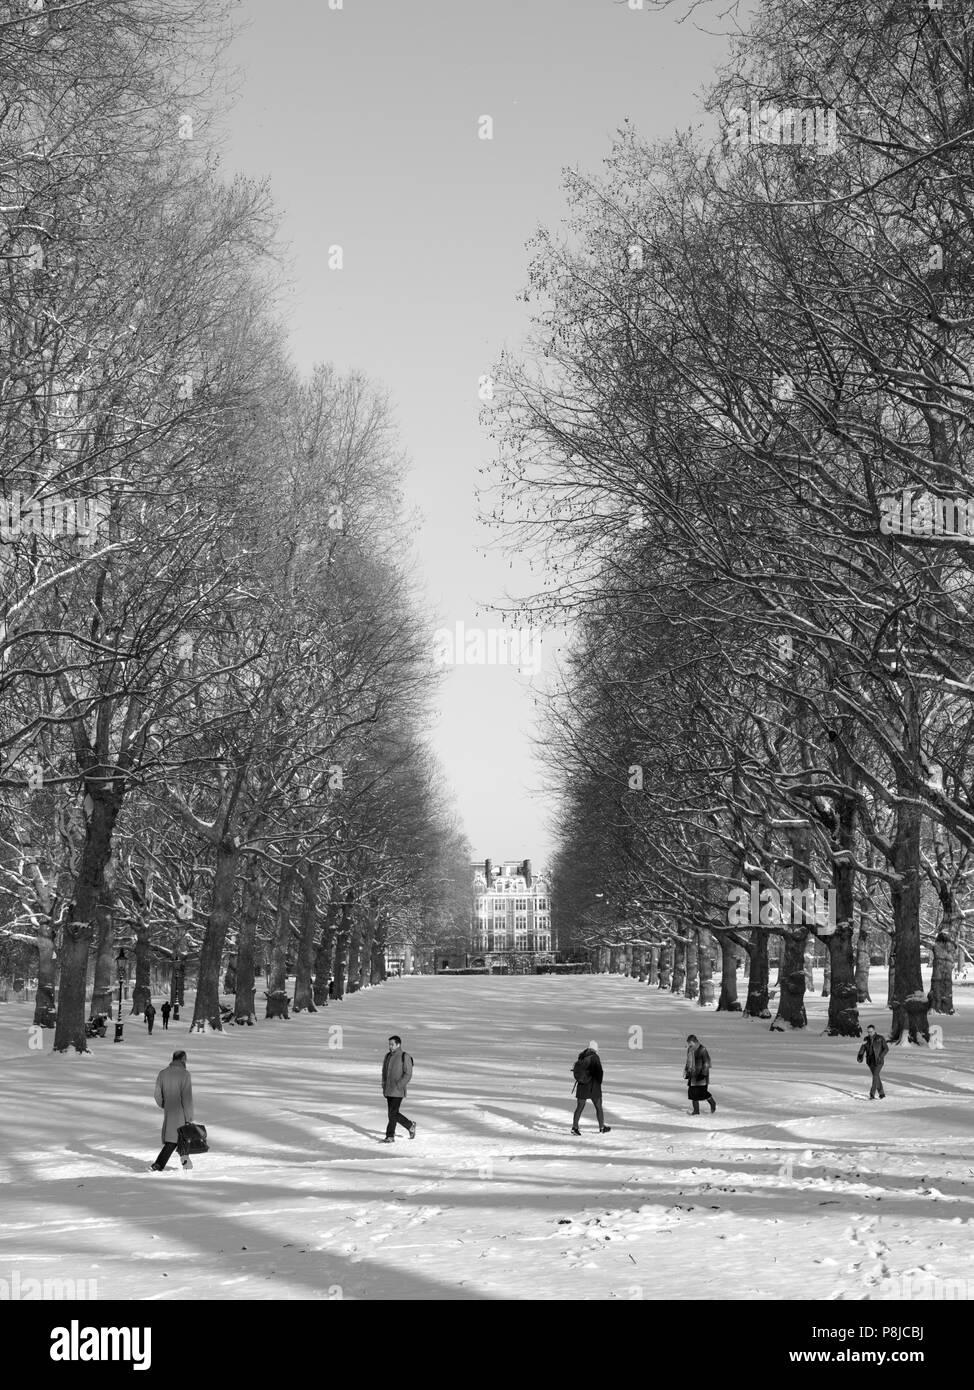 London Park, snow scene, workers commuting through snow - Stock Image